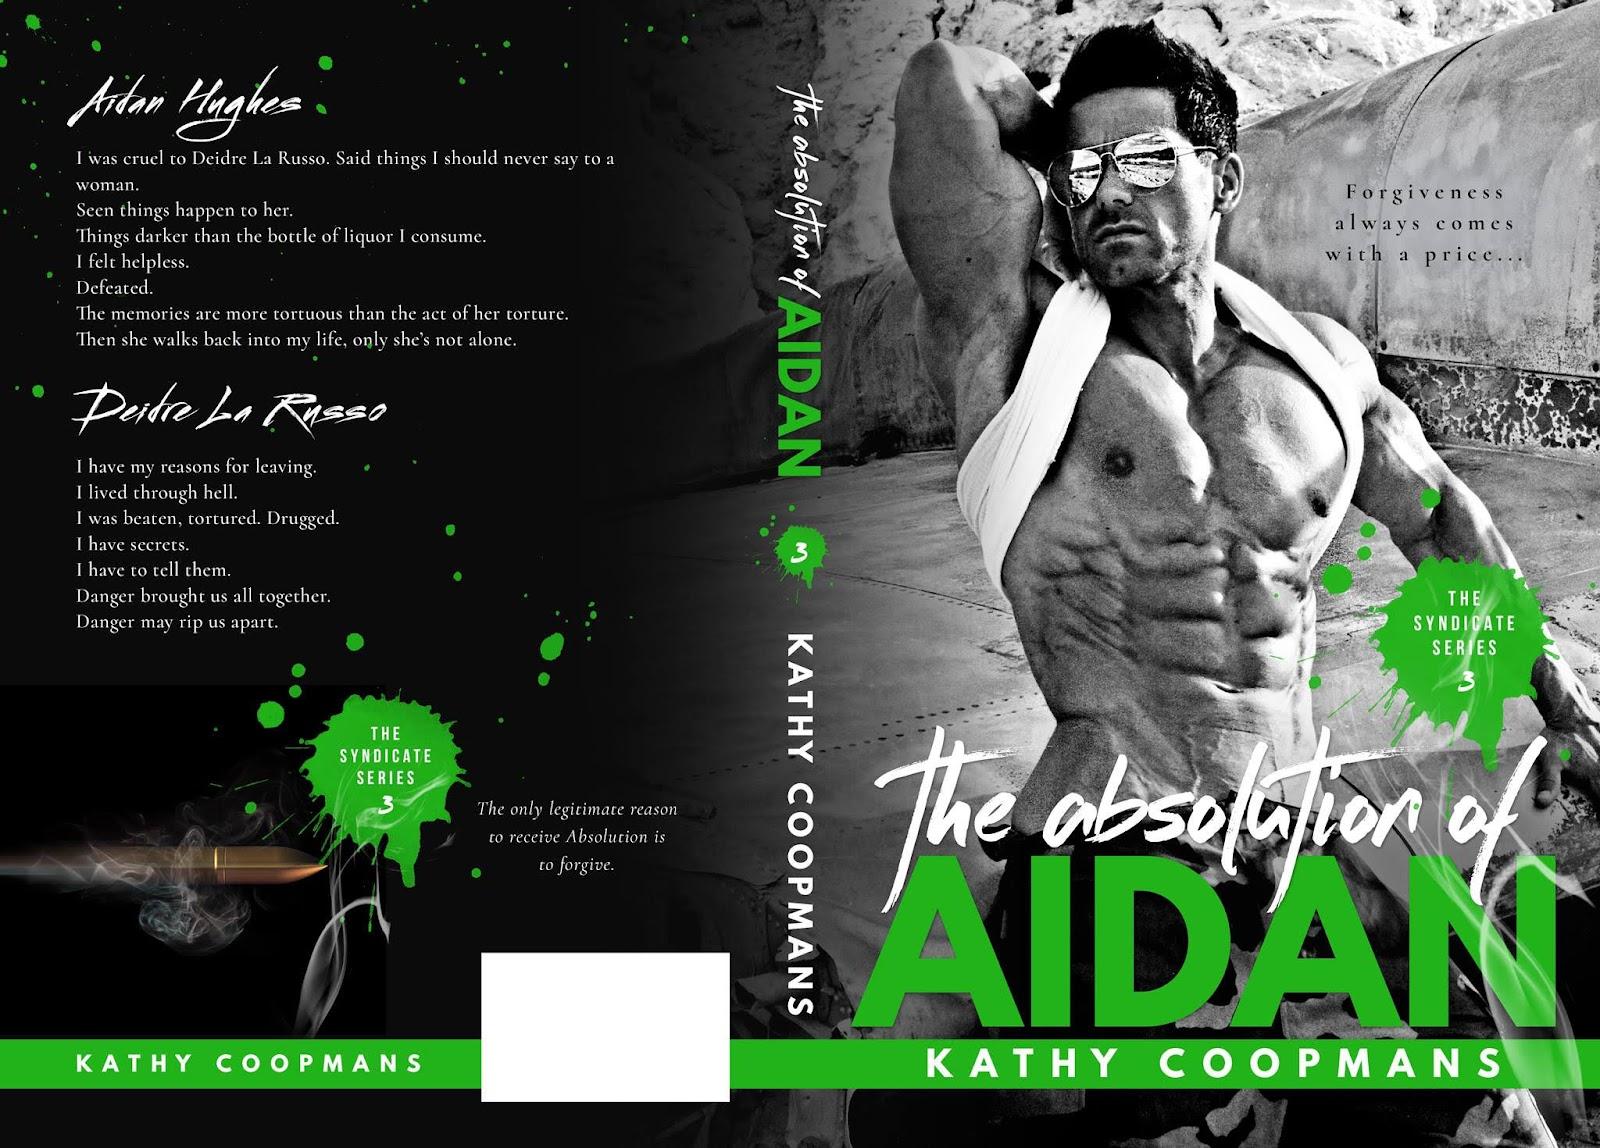 the absolution of aidan full.jpg